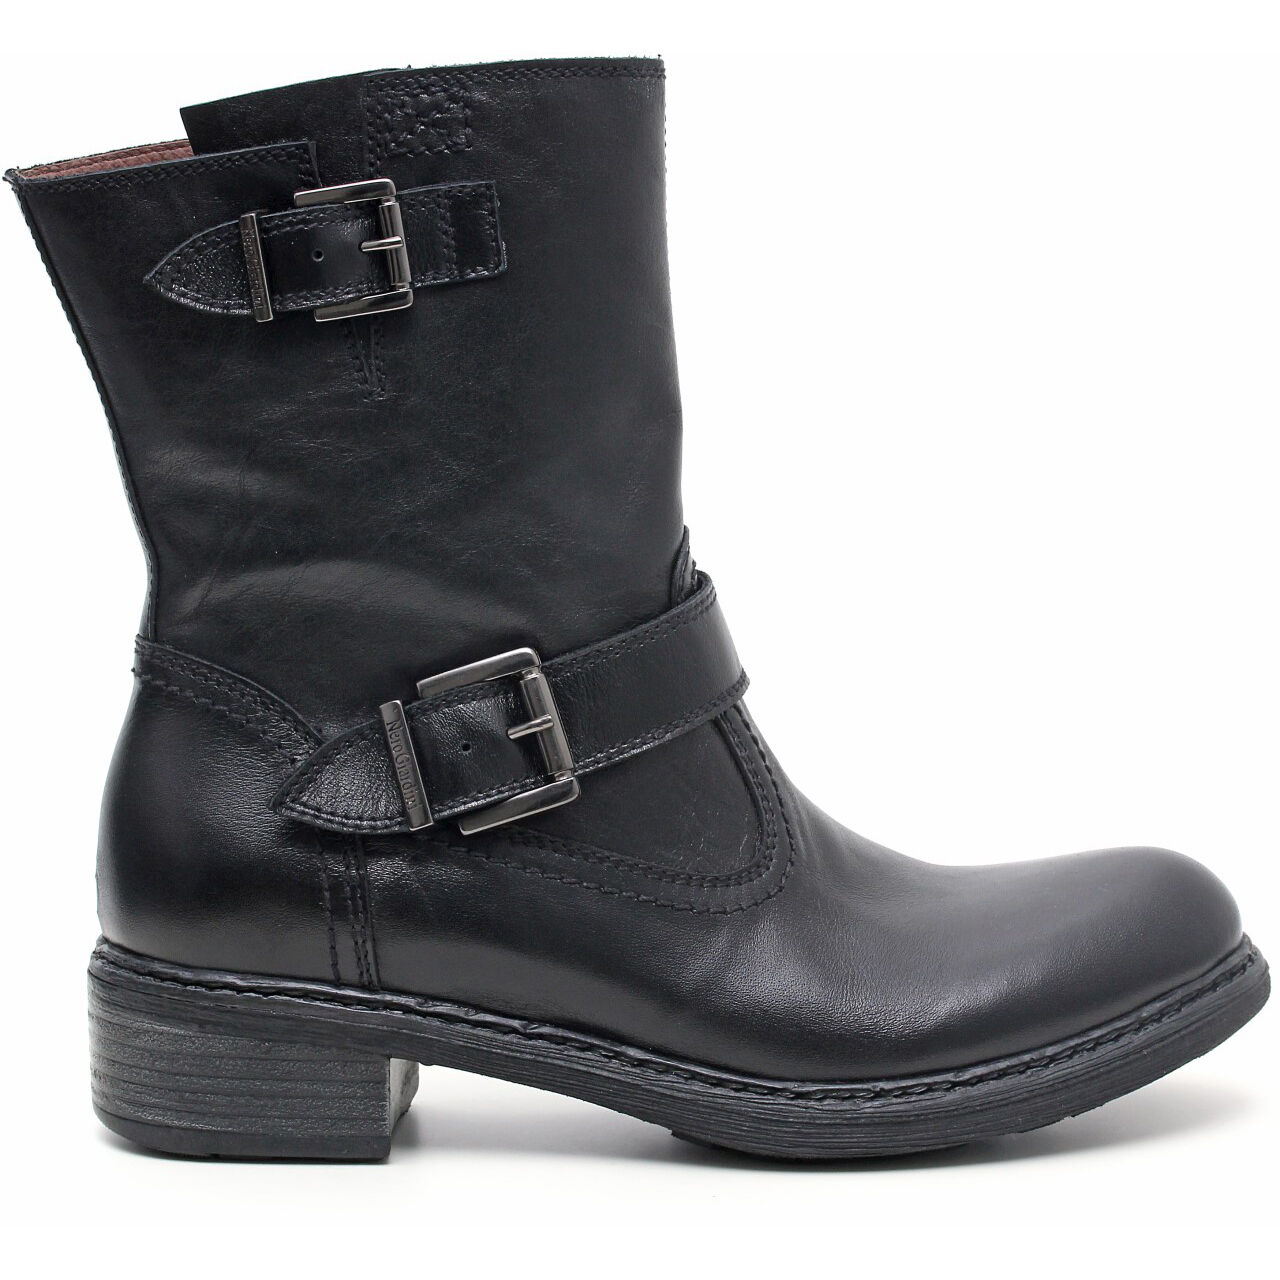 Stiefel schwarzGIARDINI A513963D neue Kollektion Kollektion Kollektion ultime Maßnahmen ef6b6c